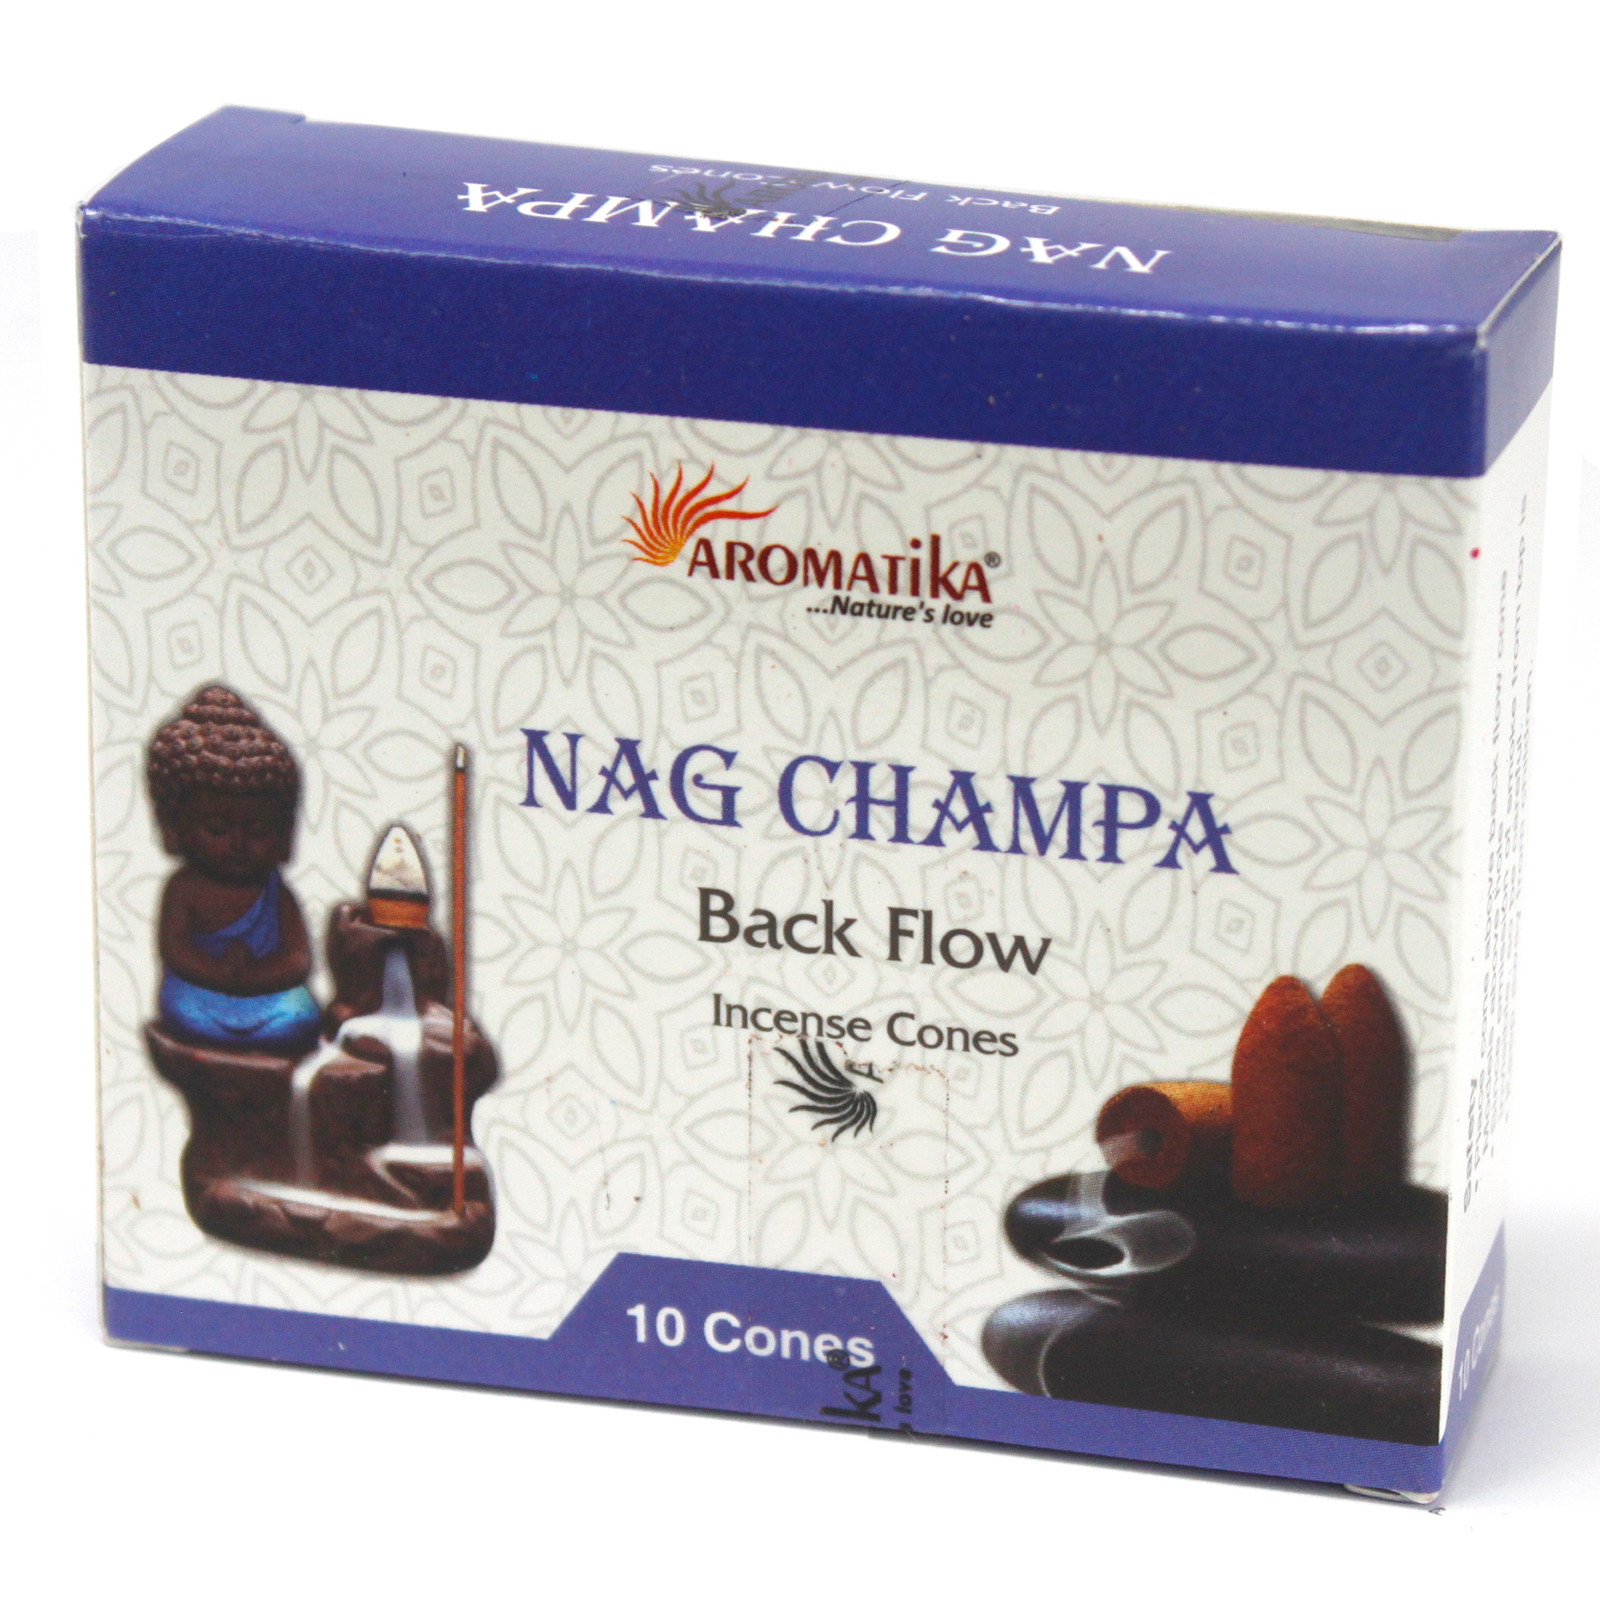 Aromatica Backflow Incense Cones Nag Champa